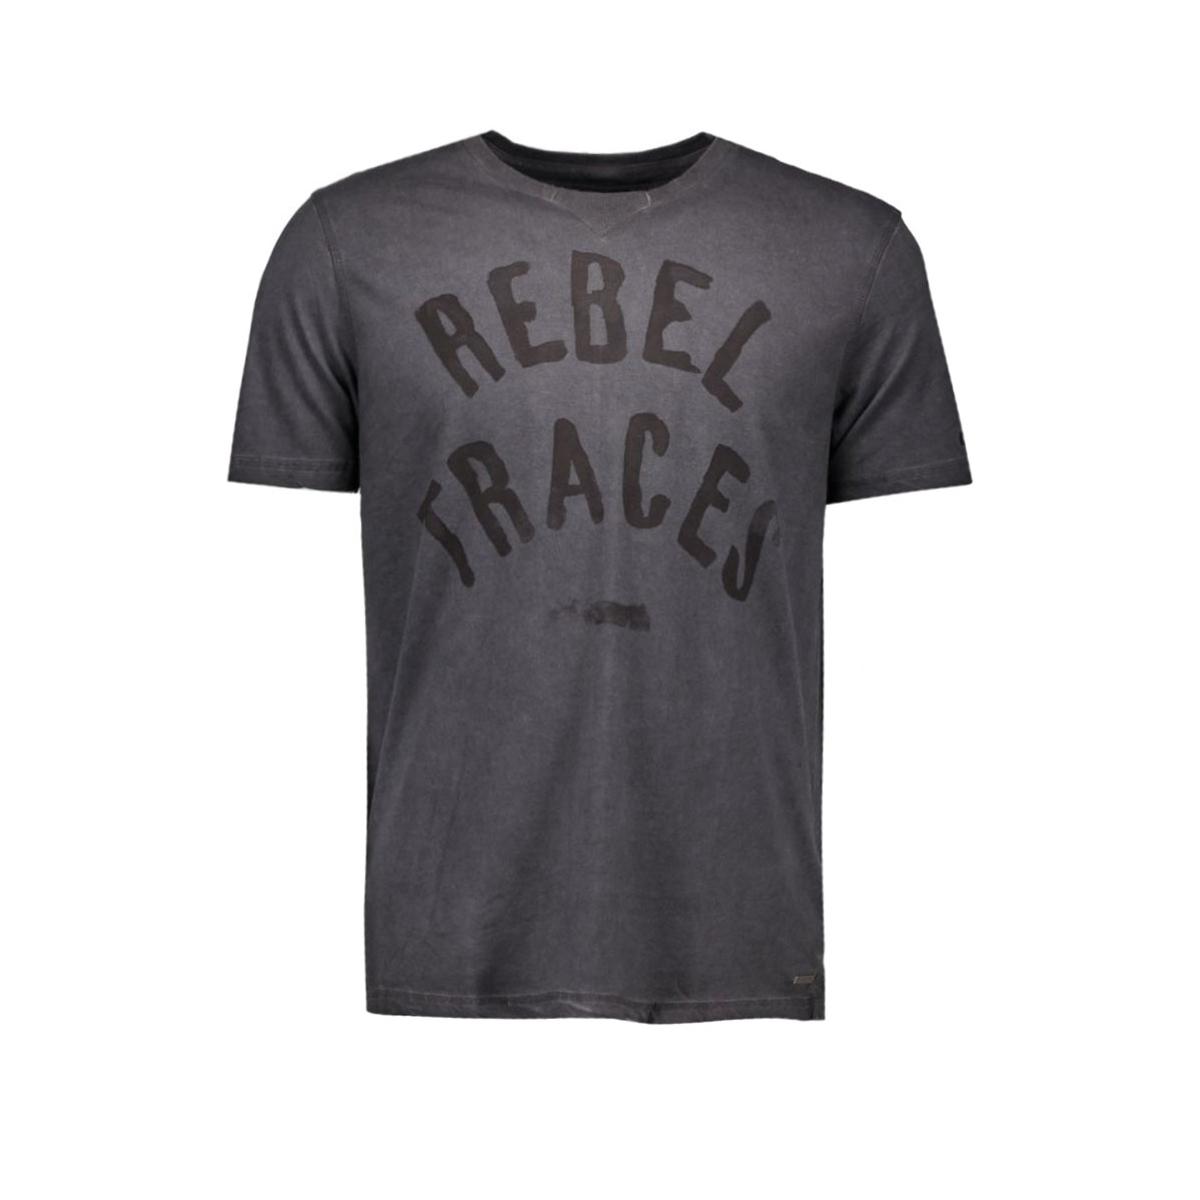 s61003 garcia t-shirt 337 shade